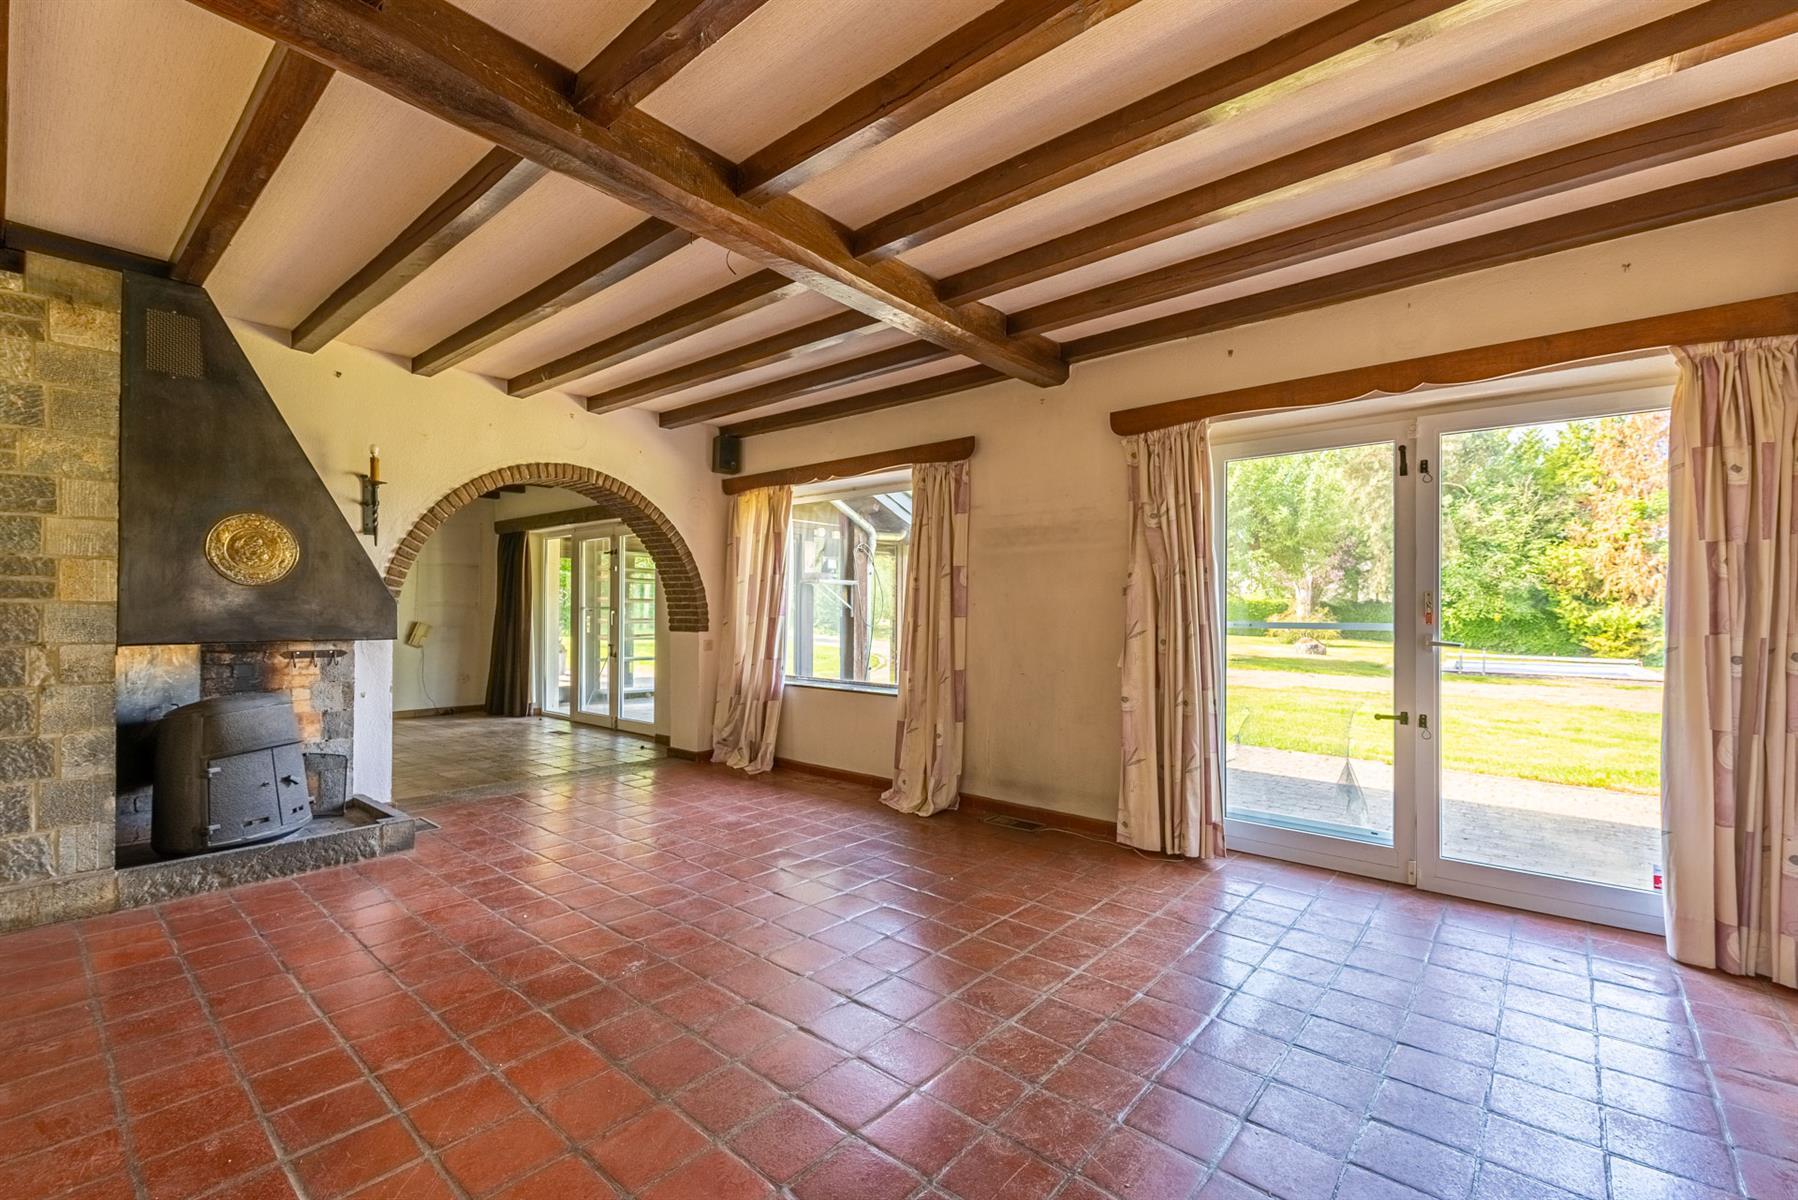 Huis - Rochefort Wavreille - #4362771-10